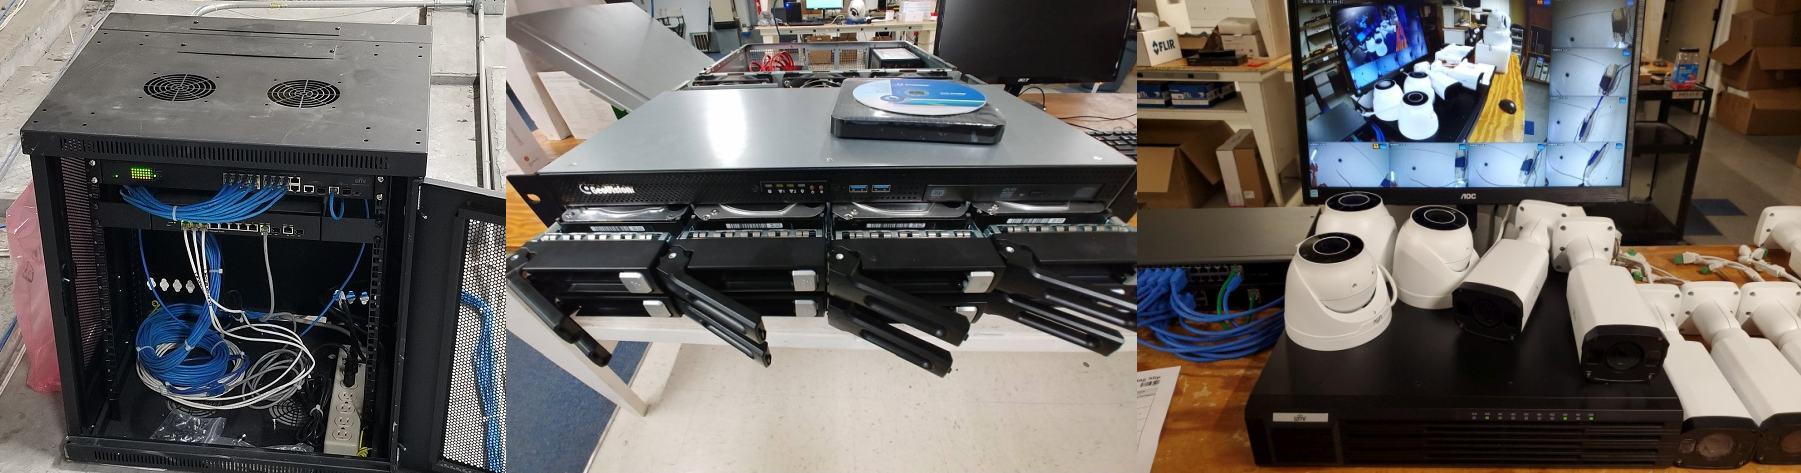 Network or Direct Attached Surveillance Storage